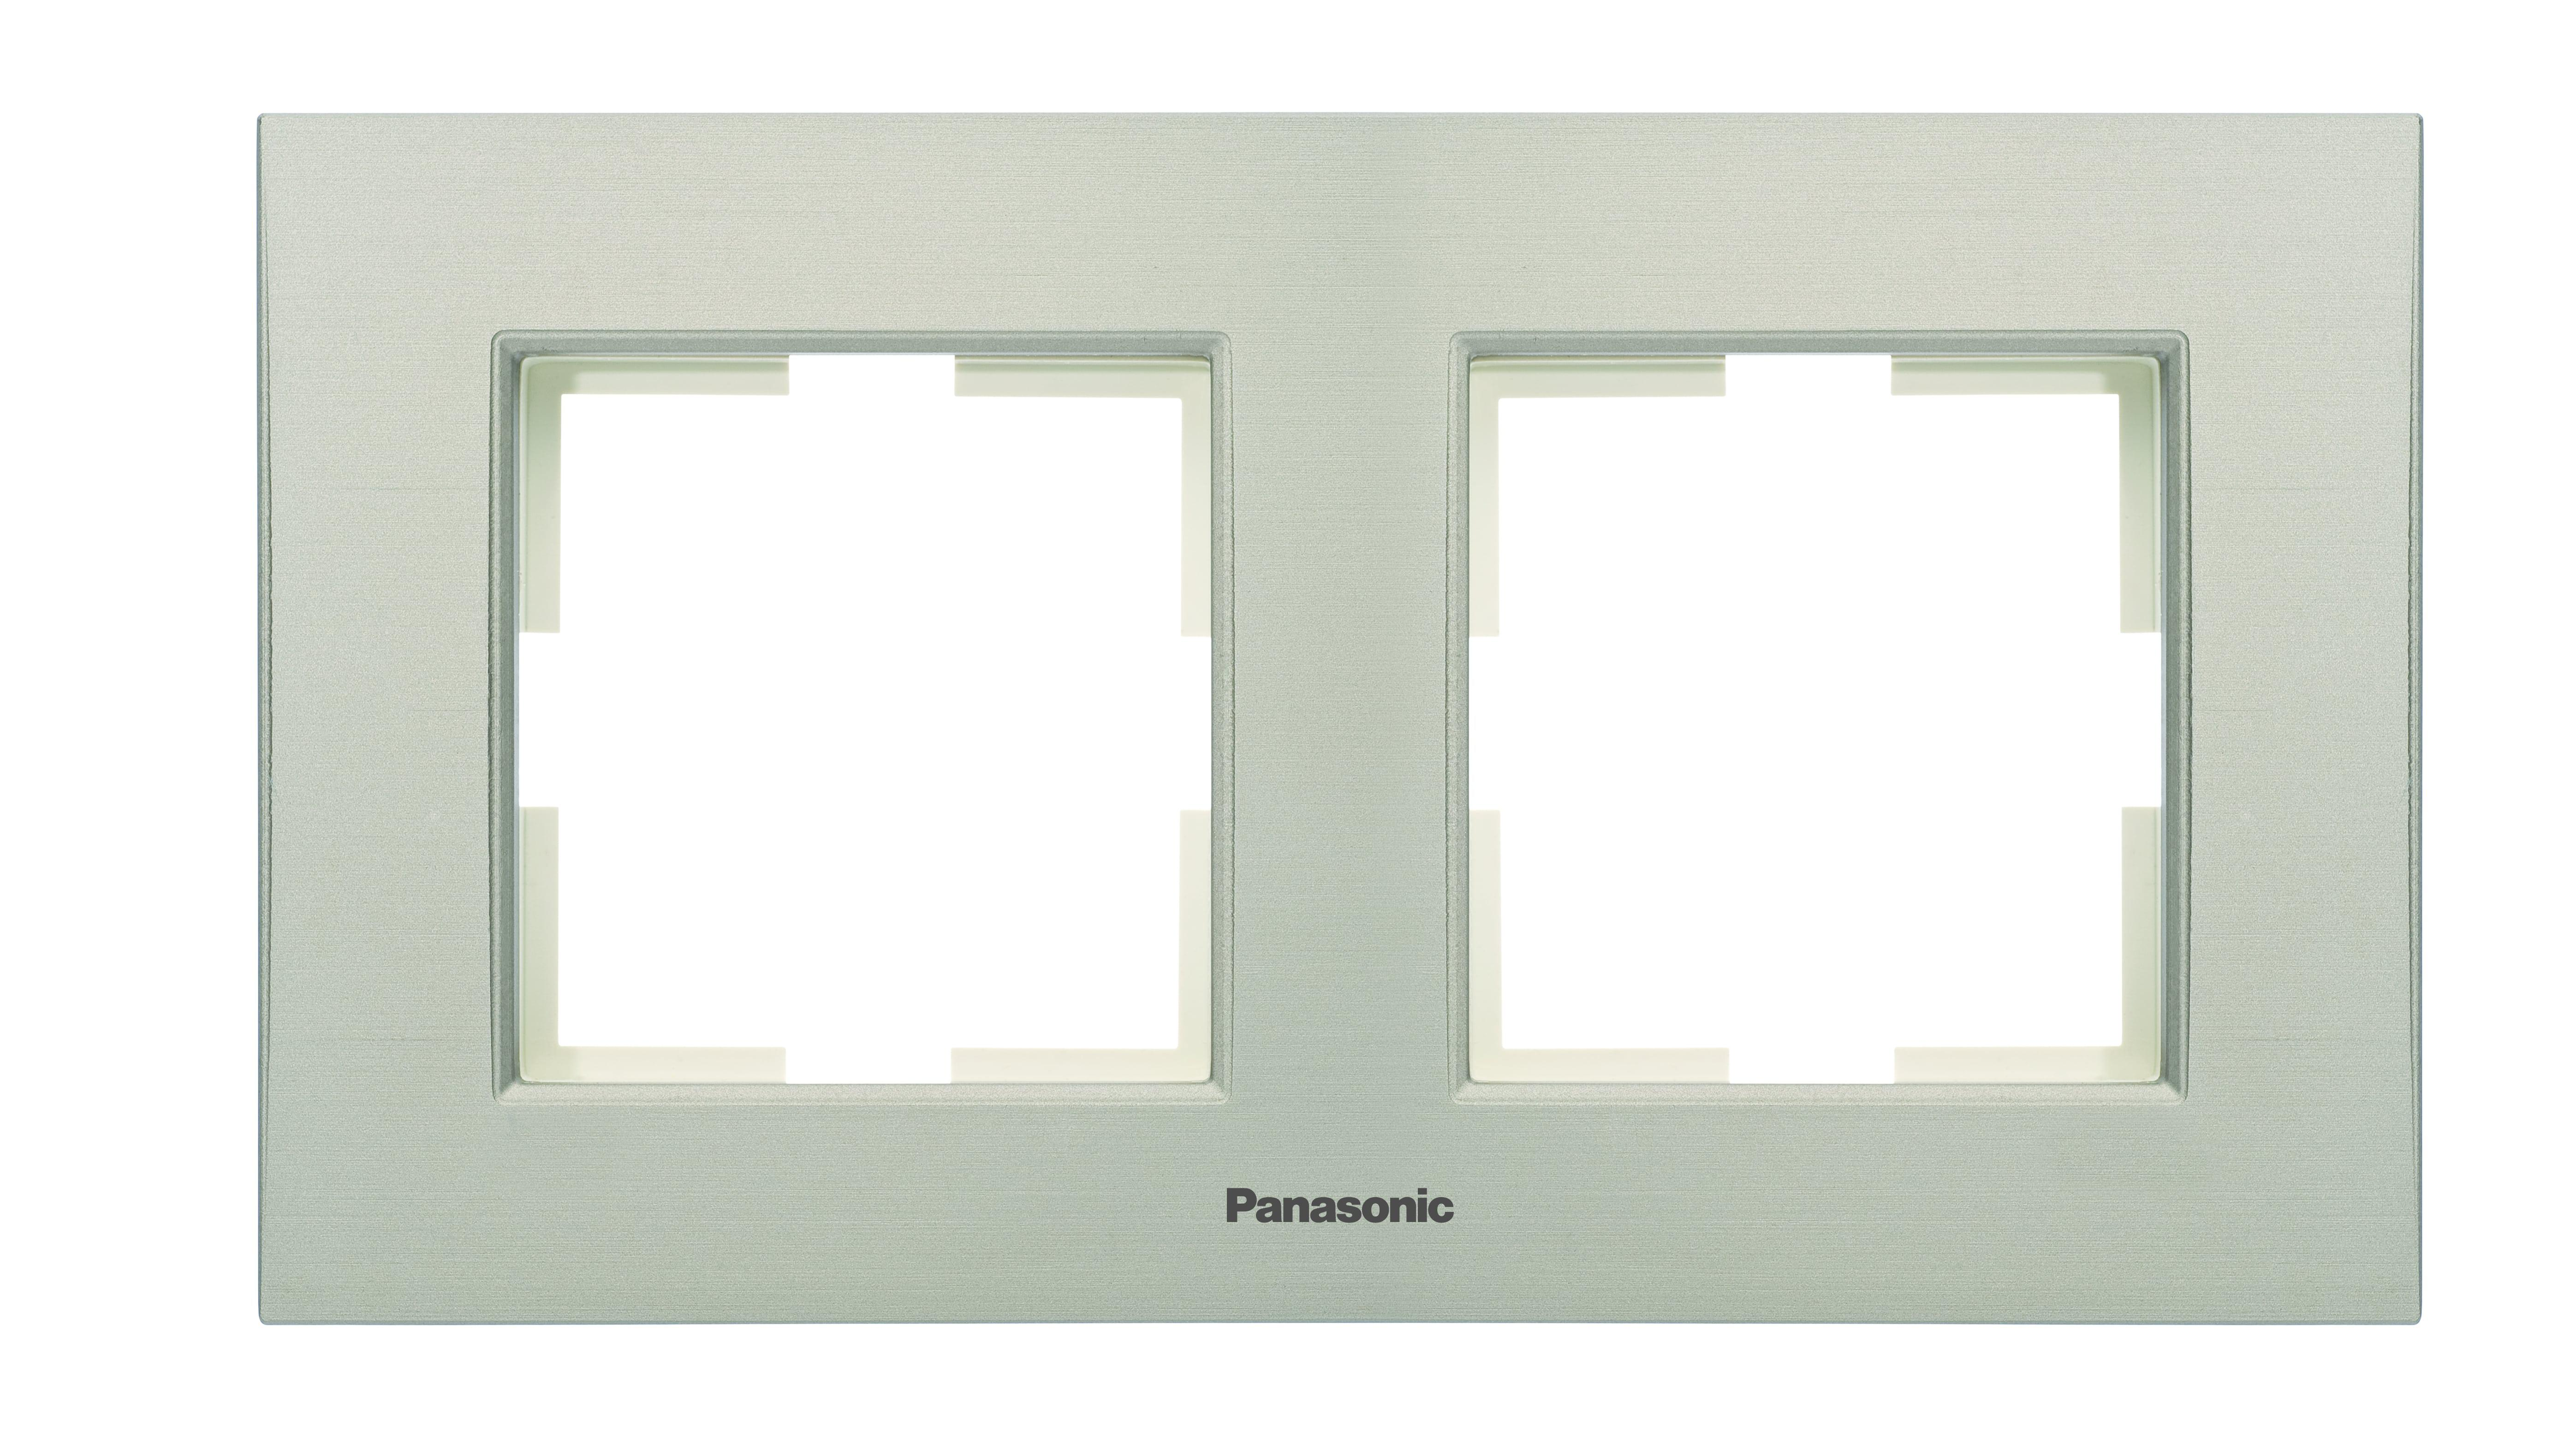 Рамка Panasonic Wktf0801-2dg-res karre plus dg рамка для фото jardo